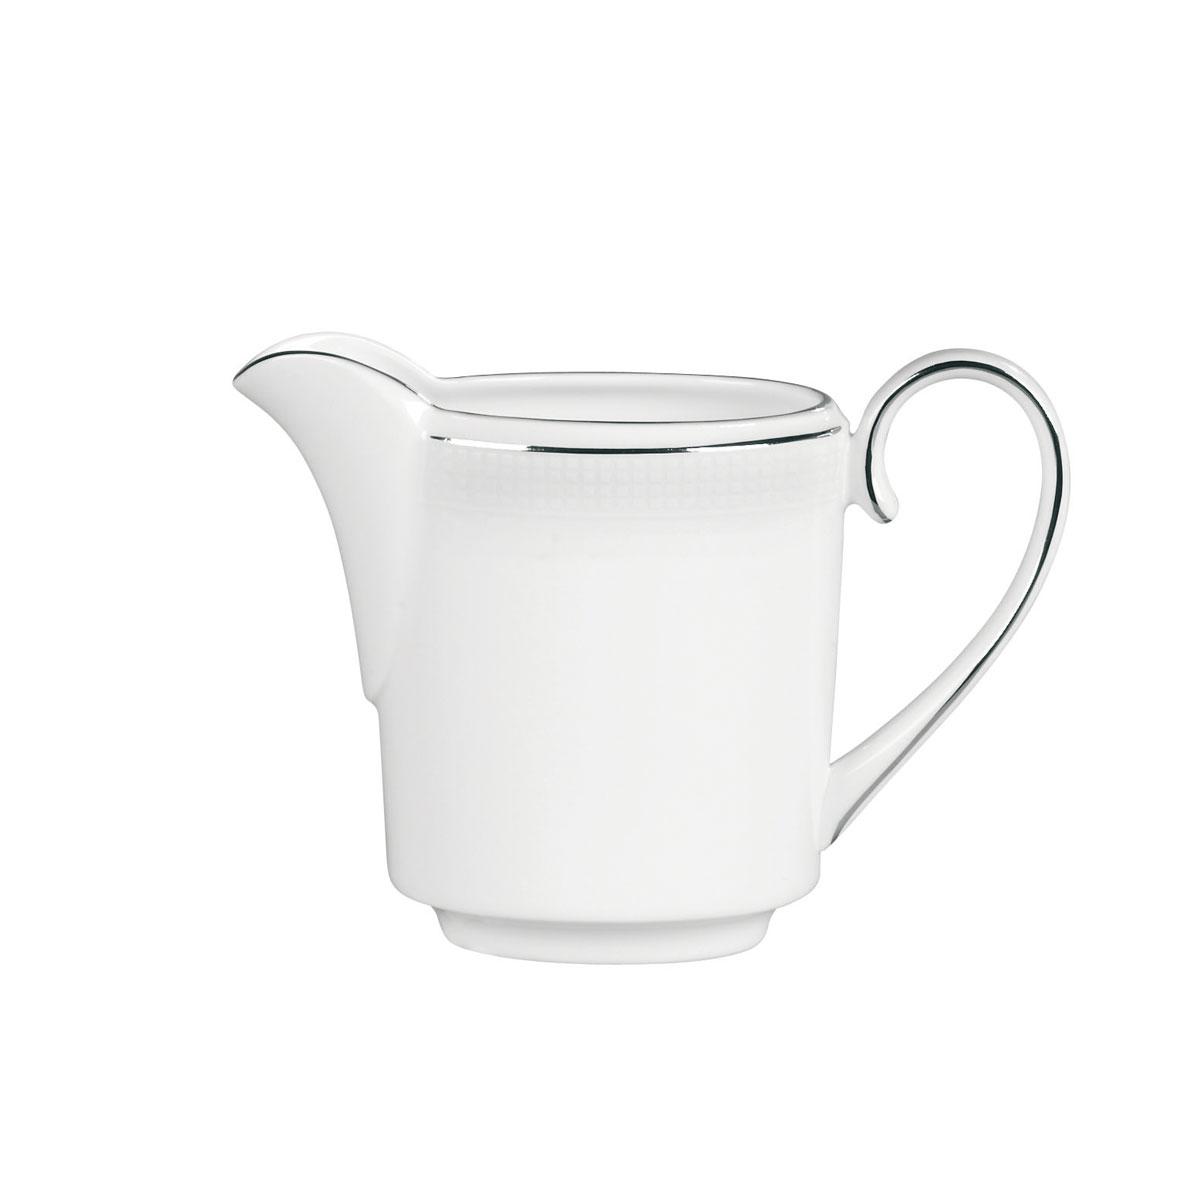 Vera Wang Wedgwood Blanc Sur Blanc Creamer Imperial